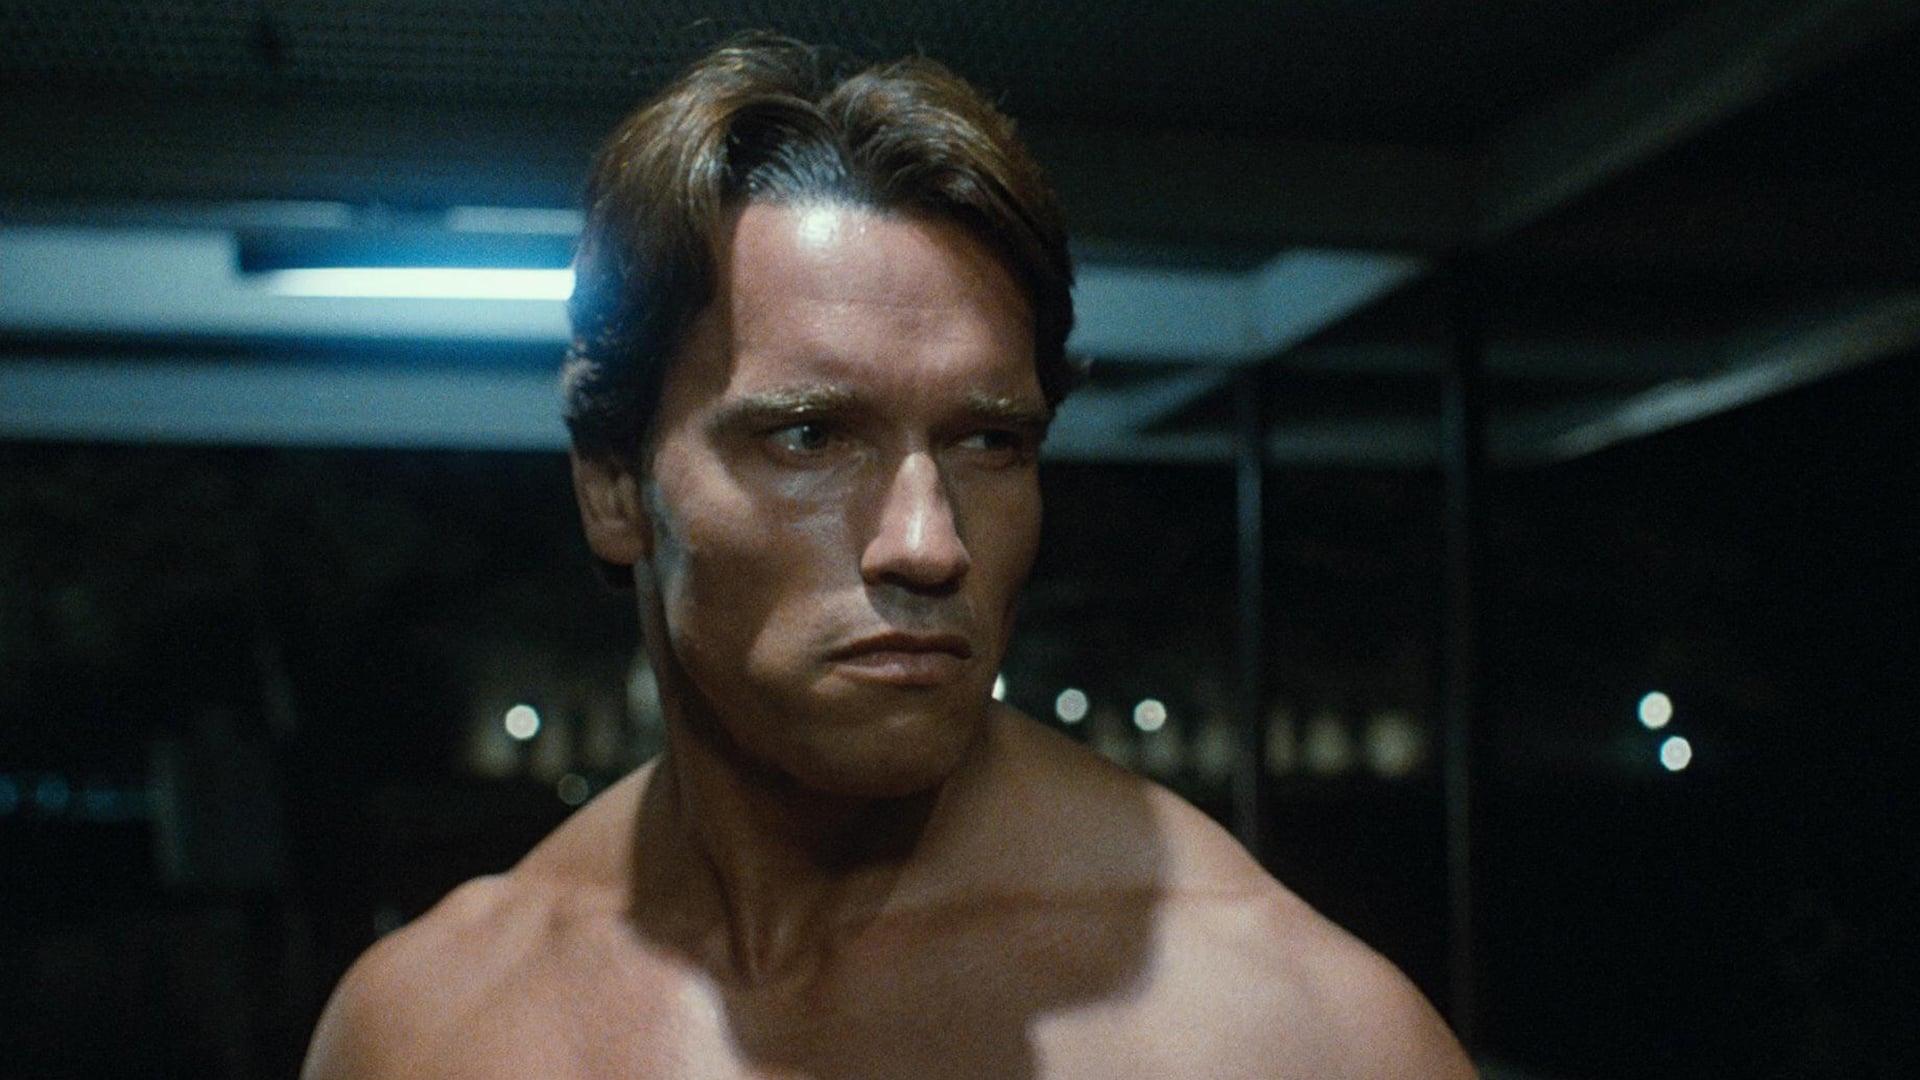 The Terminator backdrop